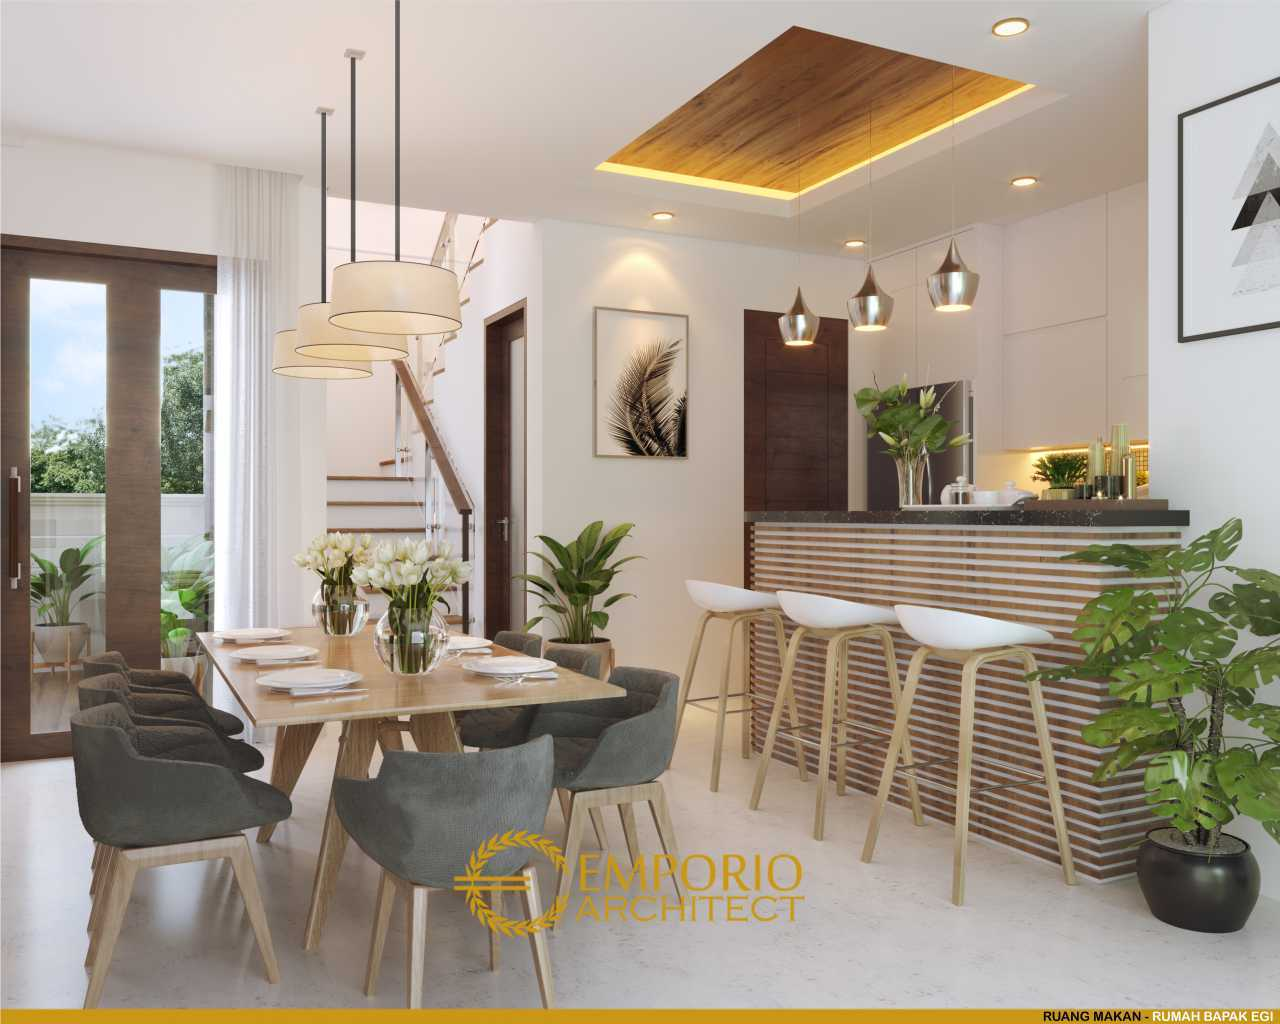 Emporio Architect Jasa Arsitek Denpasar Desain Rumah Modern Tropis 734 @ Denpasar, Bali Kota Denpasar, Bali, Indonesia Kota Denpasar, Bali, Indonesia Emporio-Architect-Jasa-Arsitek-Denpasar-Desain-Rumah-Modern-Tropis-734-Denpasar-Bali  85482